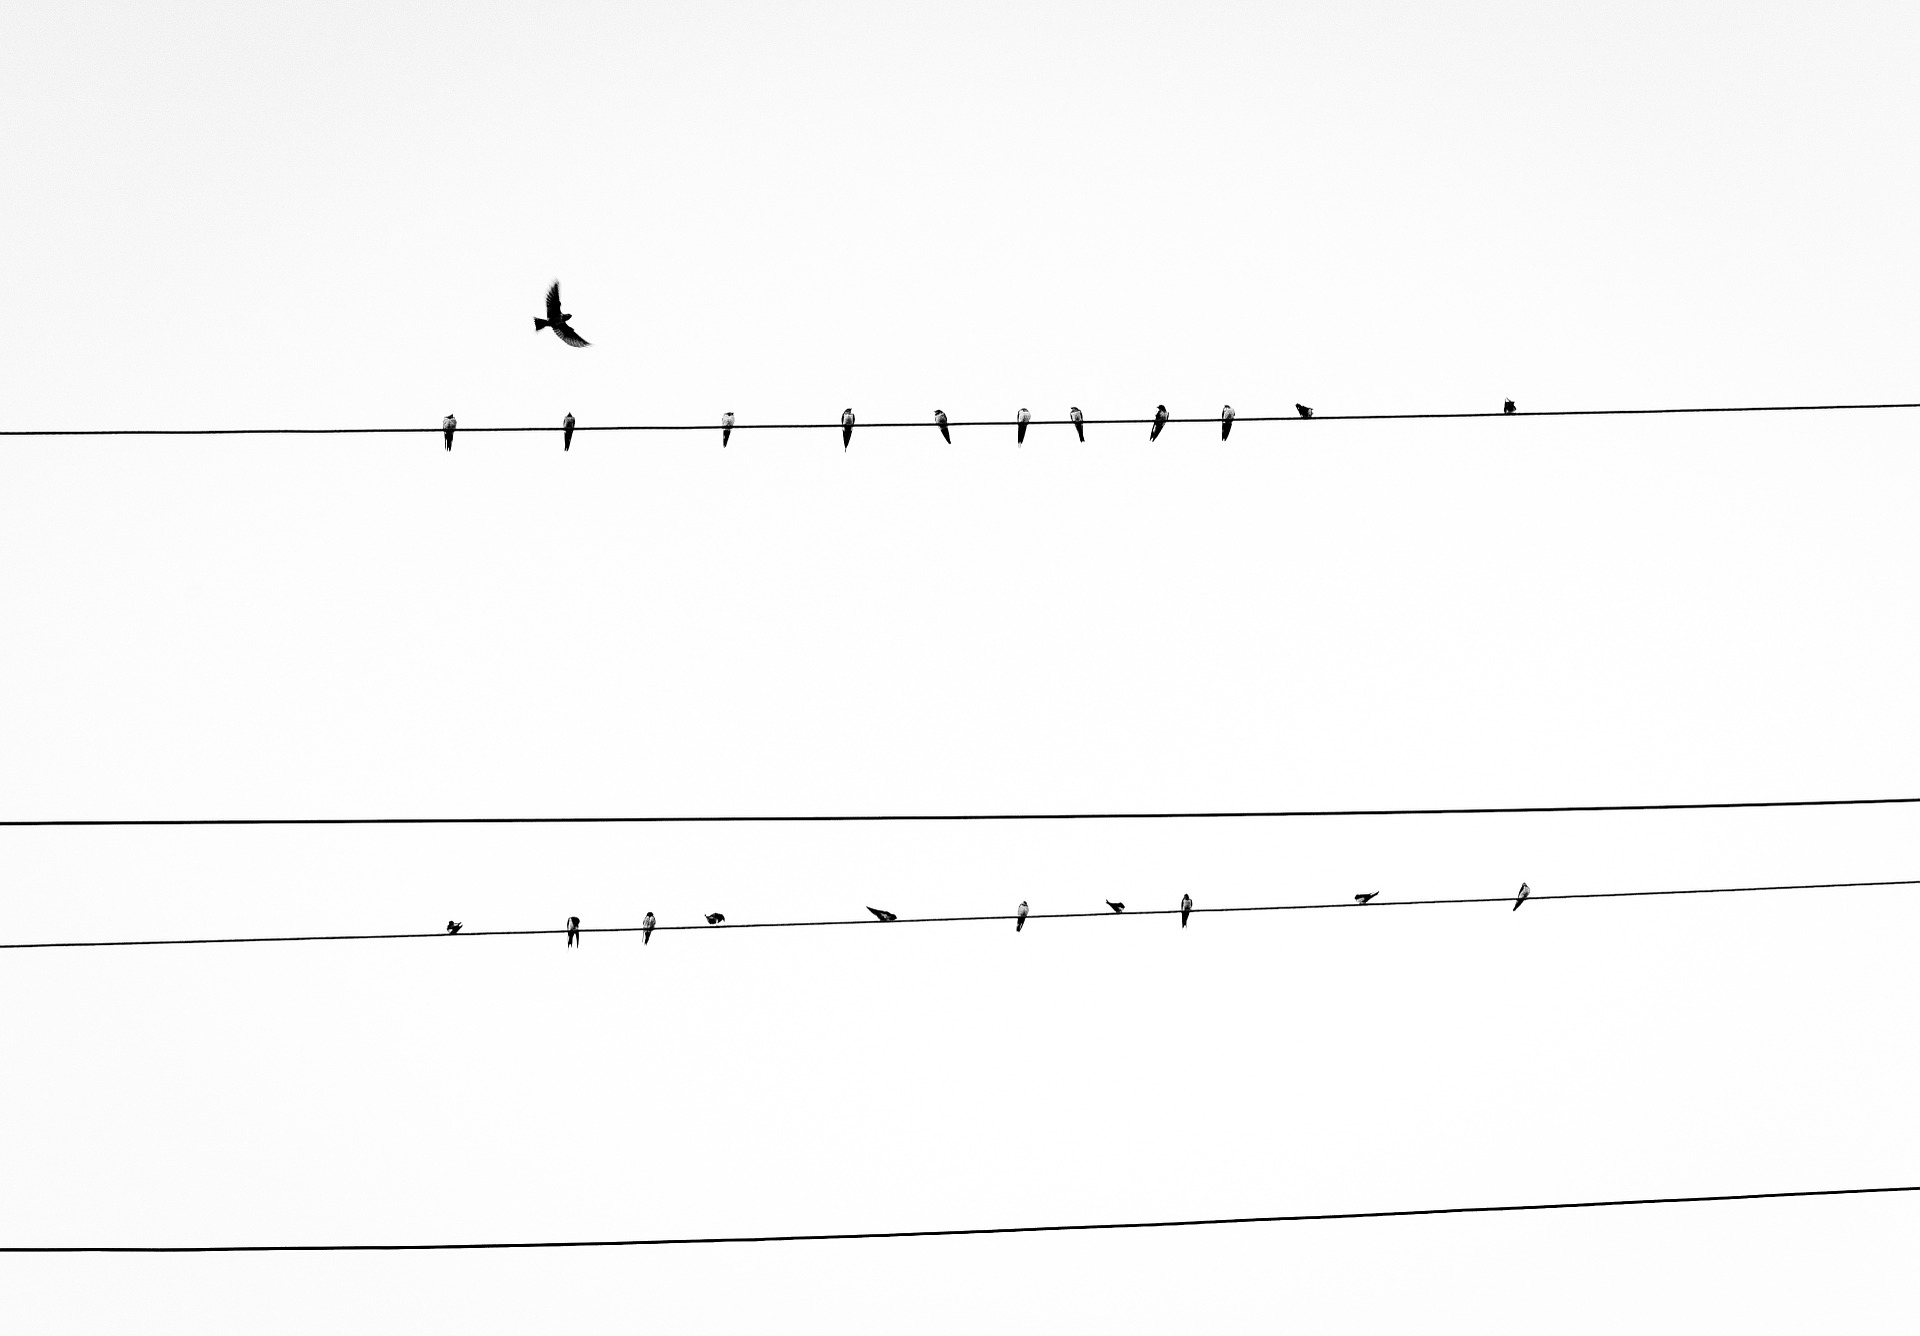 electrical-line-1149980_1920.jpg